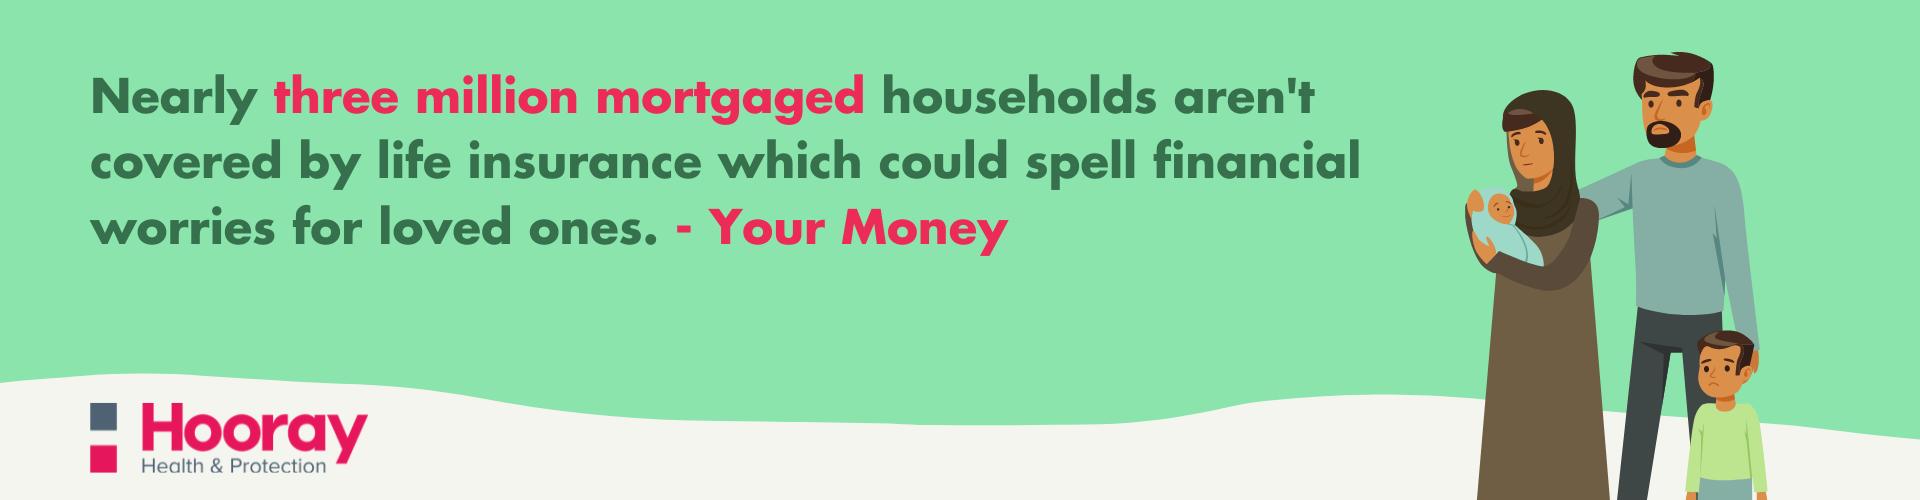 Life Insurance Mortgage